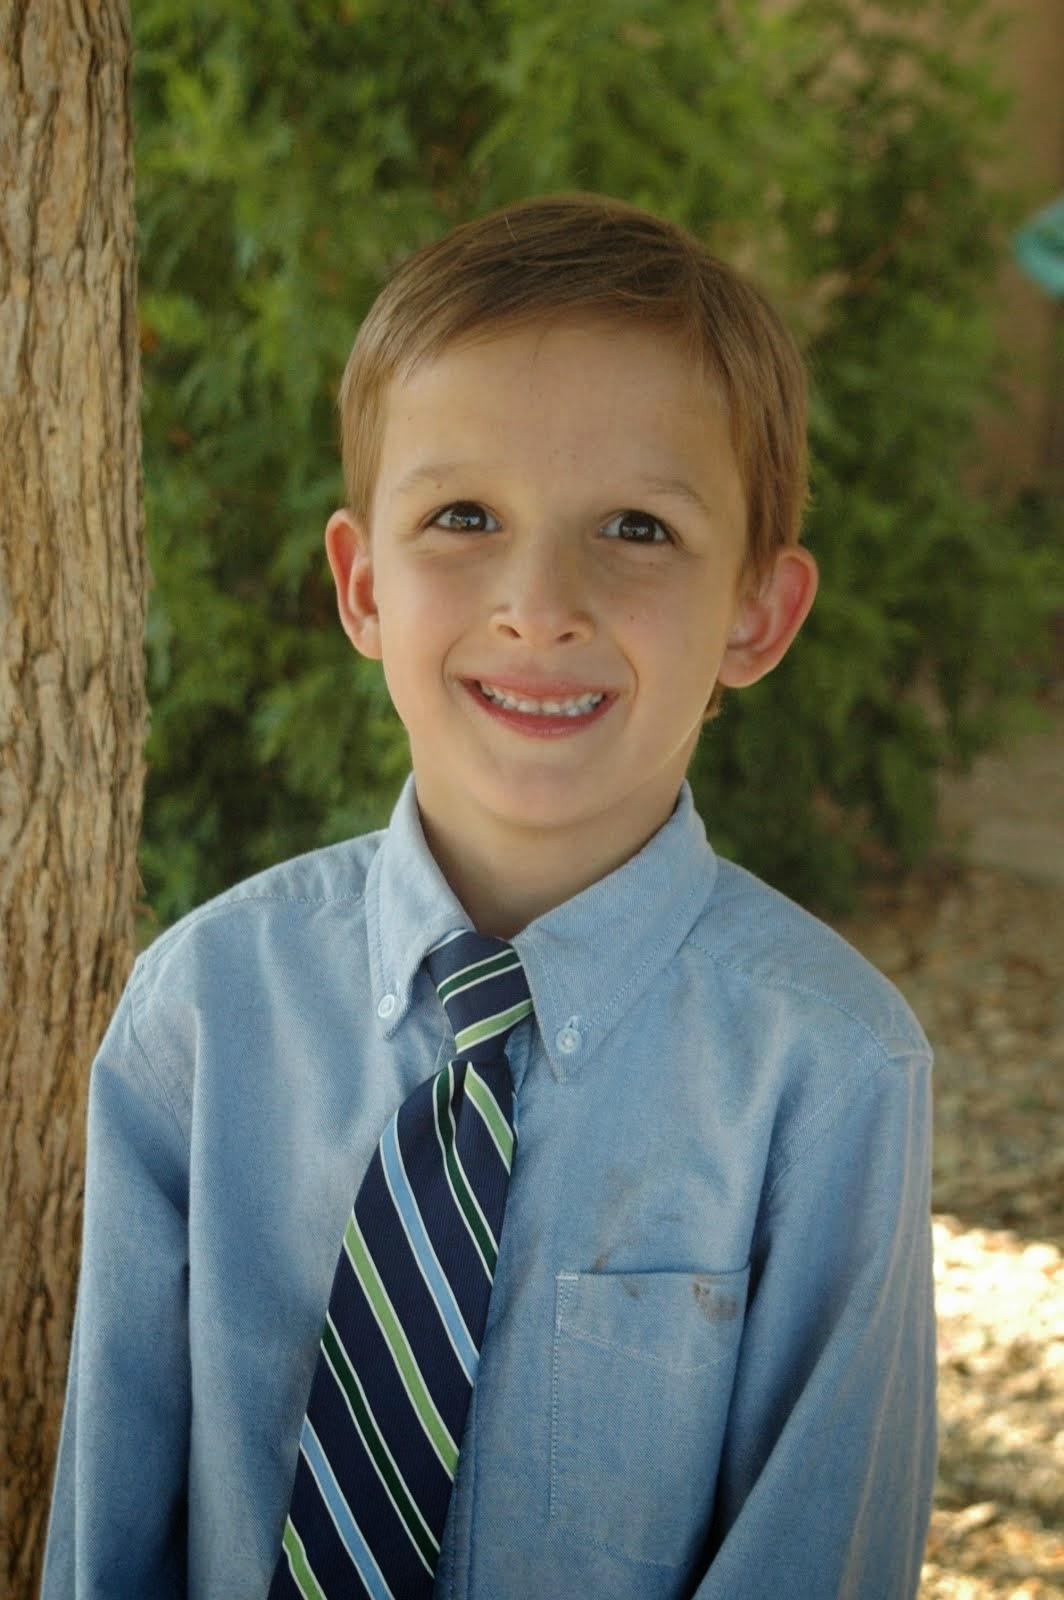 Caleb, 7